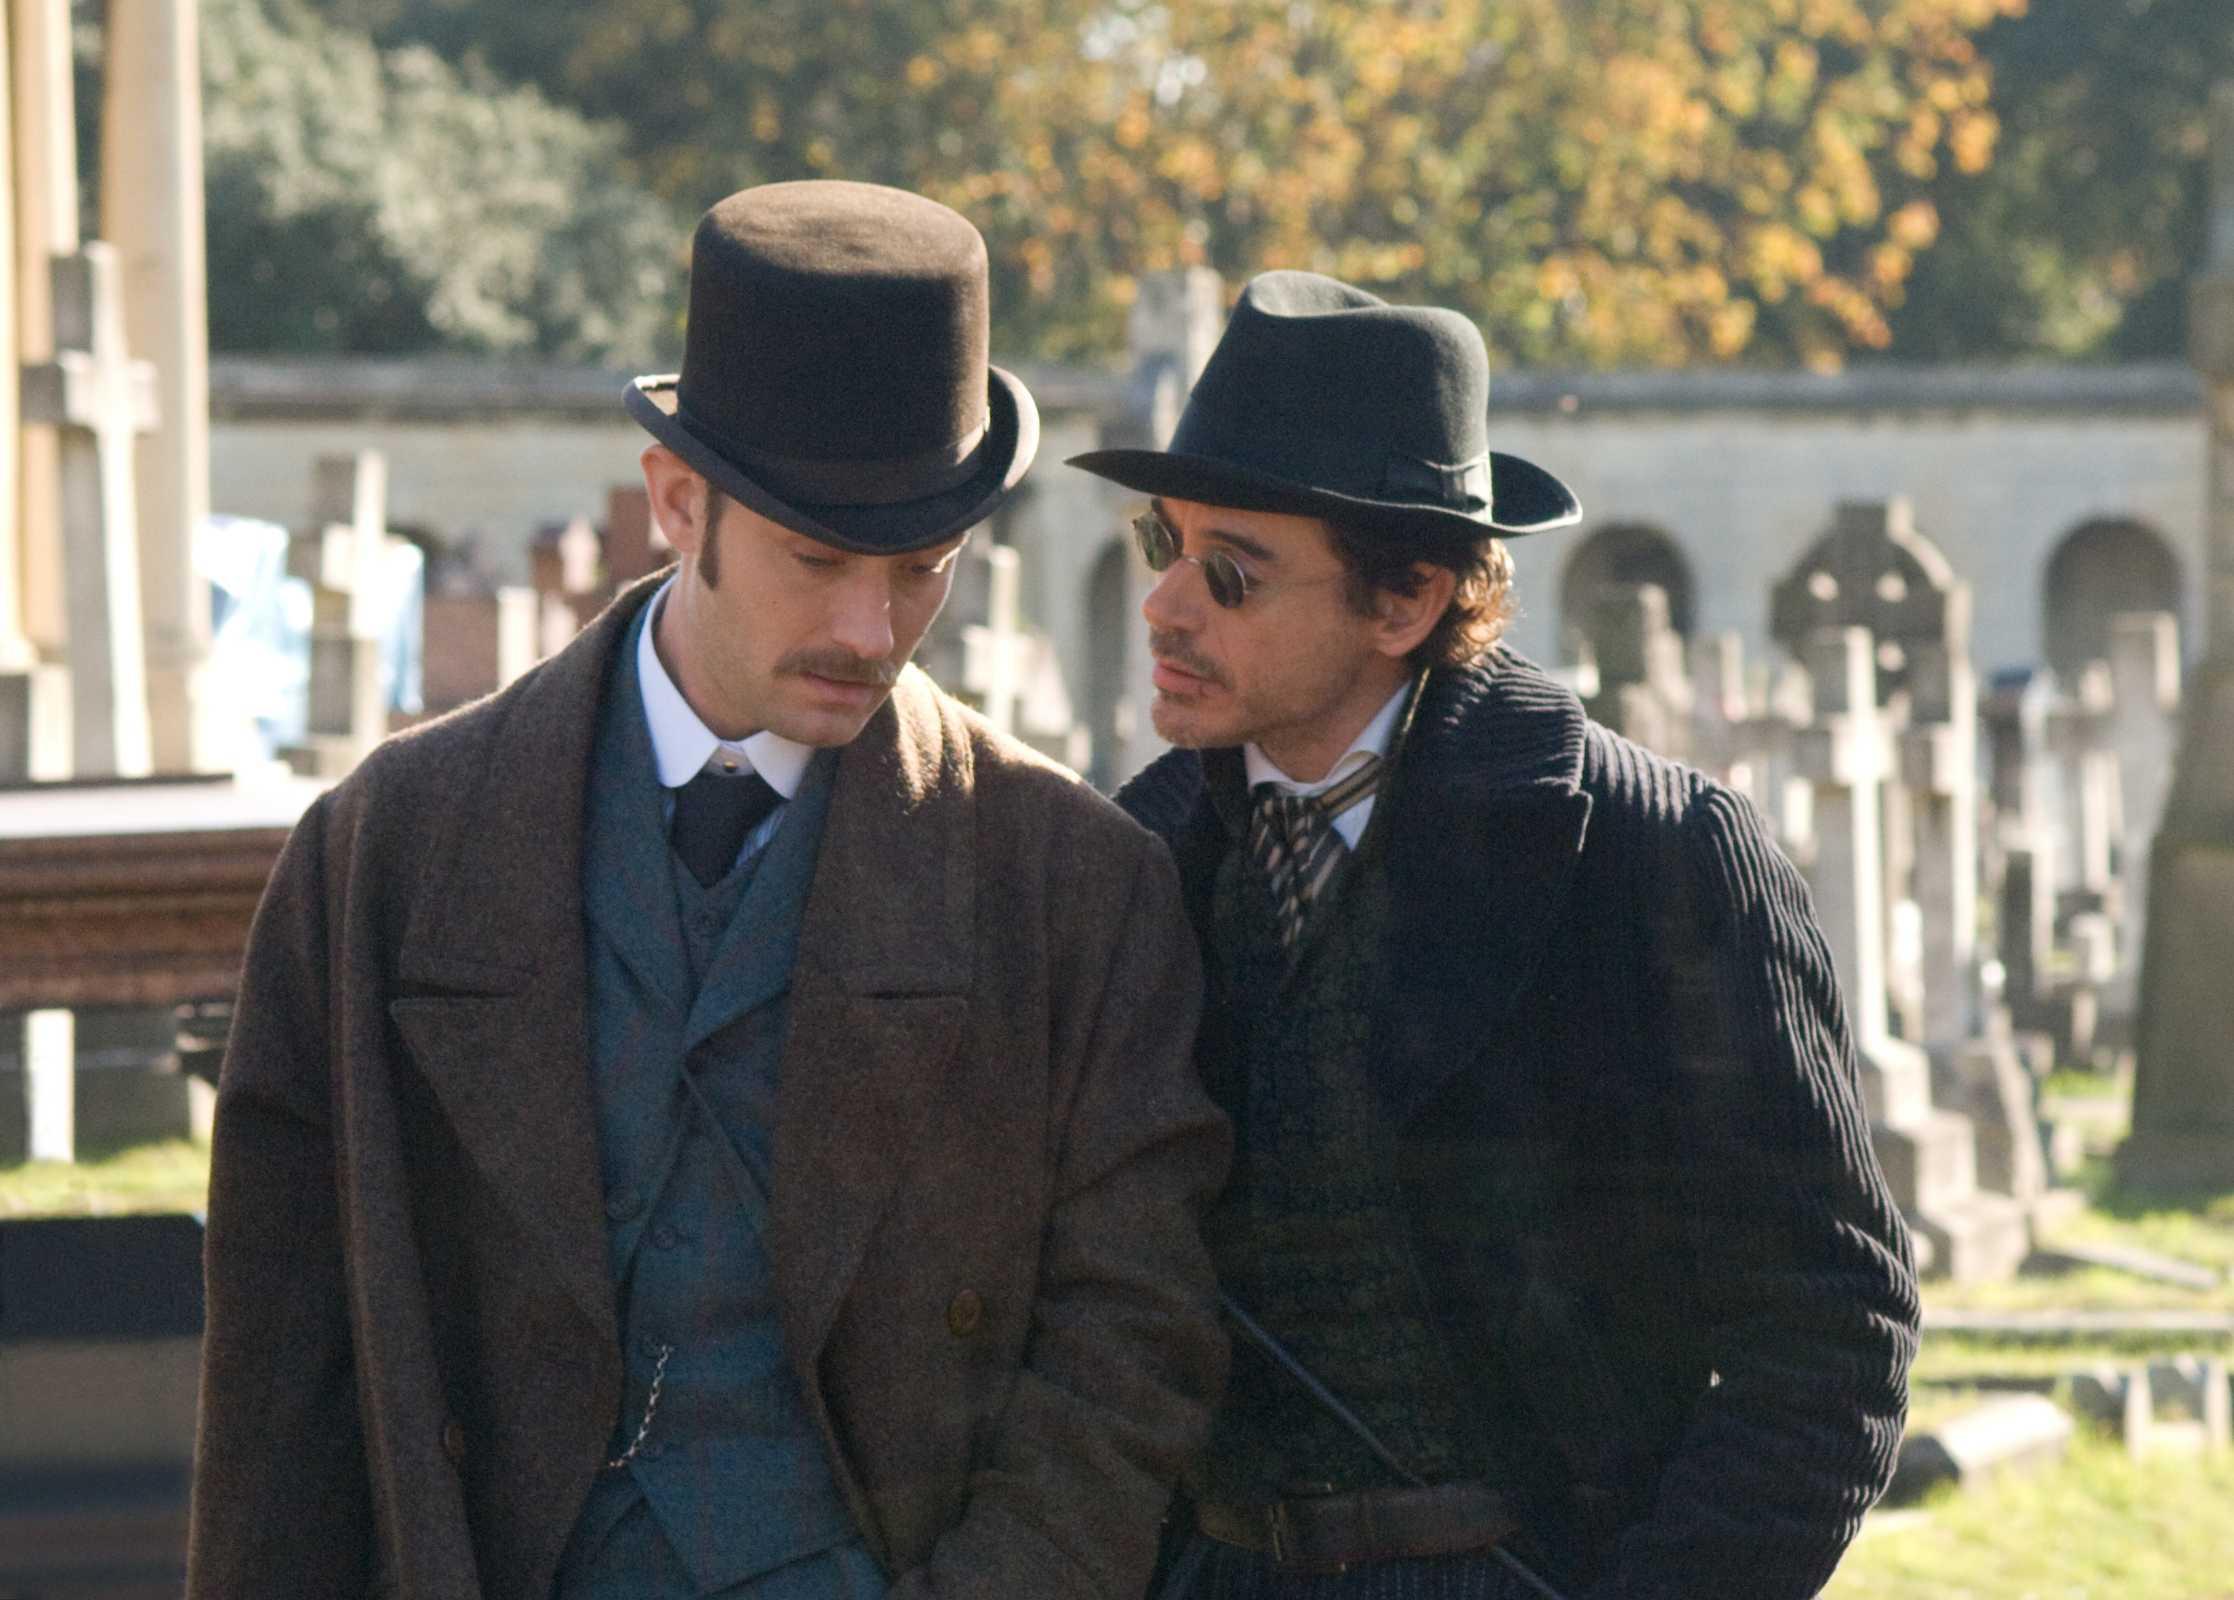 кадры из фильма Шерлок Холмс Джуд Лоу, Роберт Дауни-мл.,